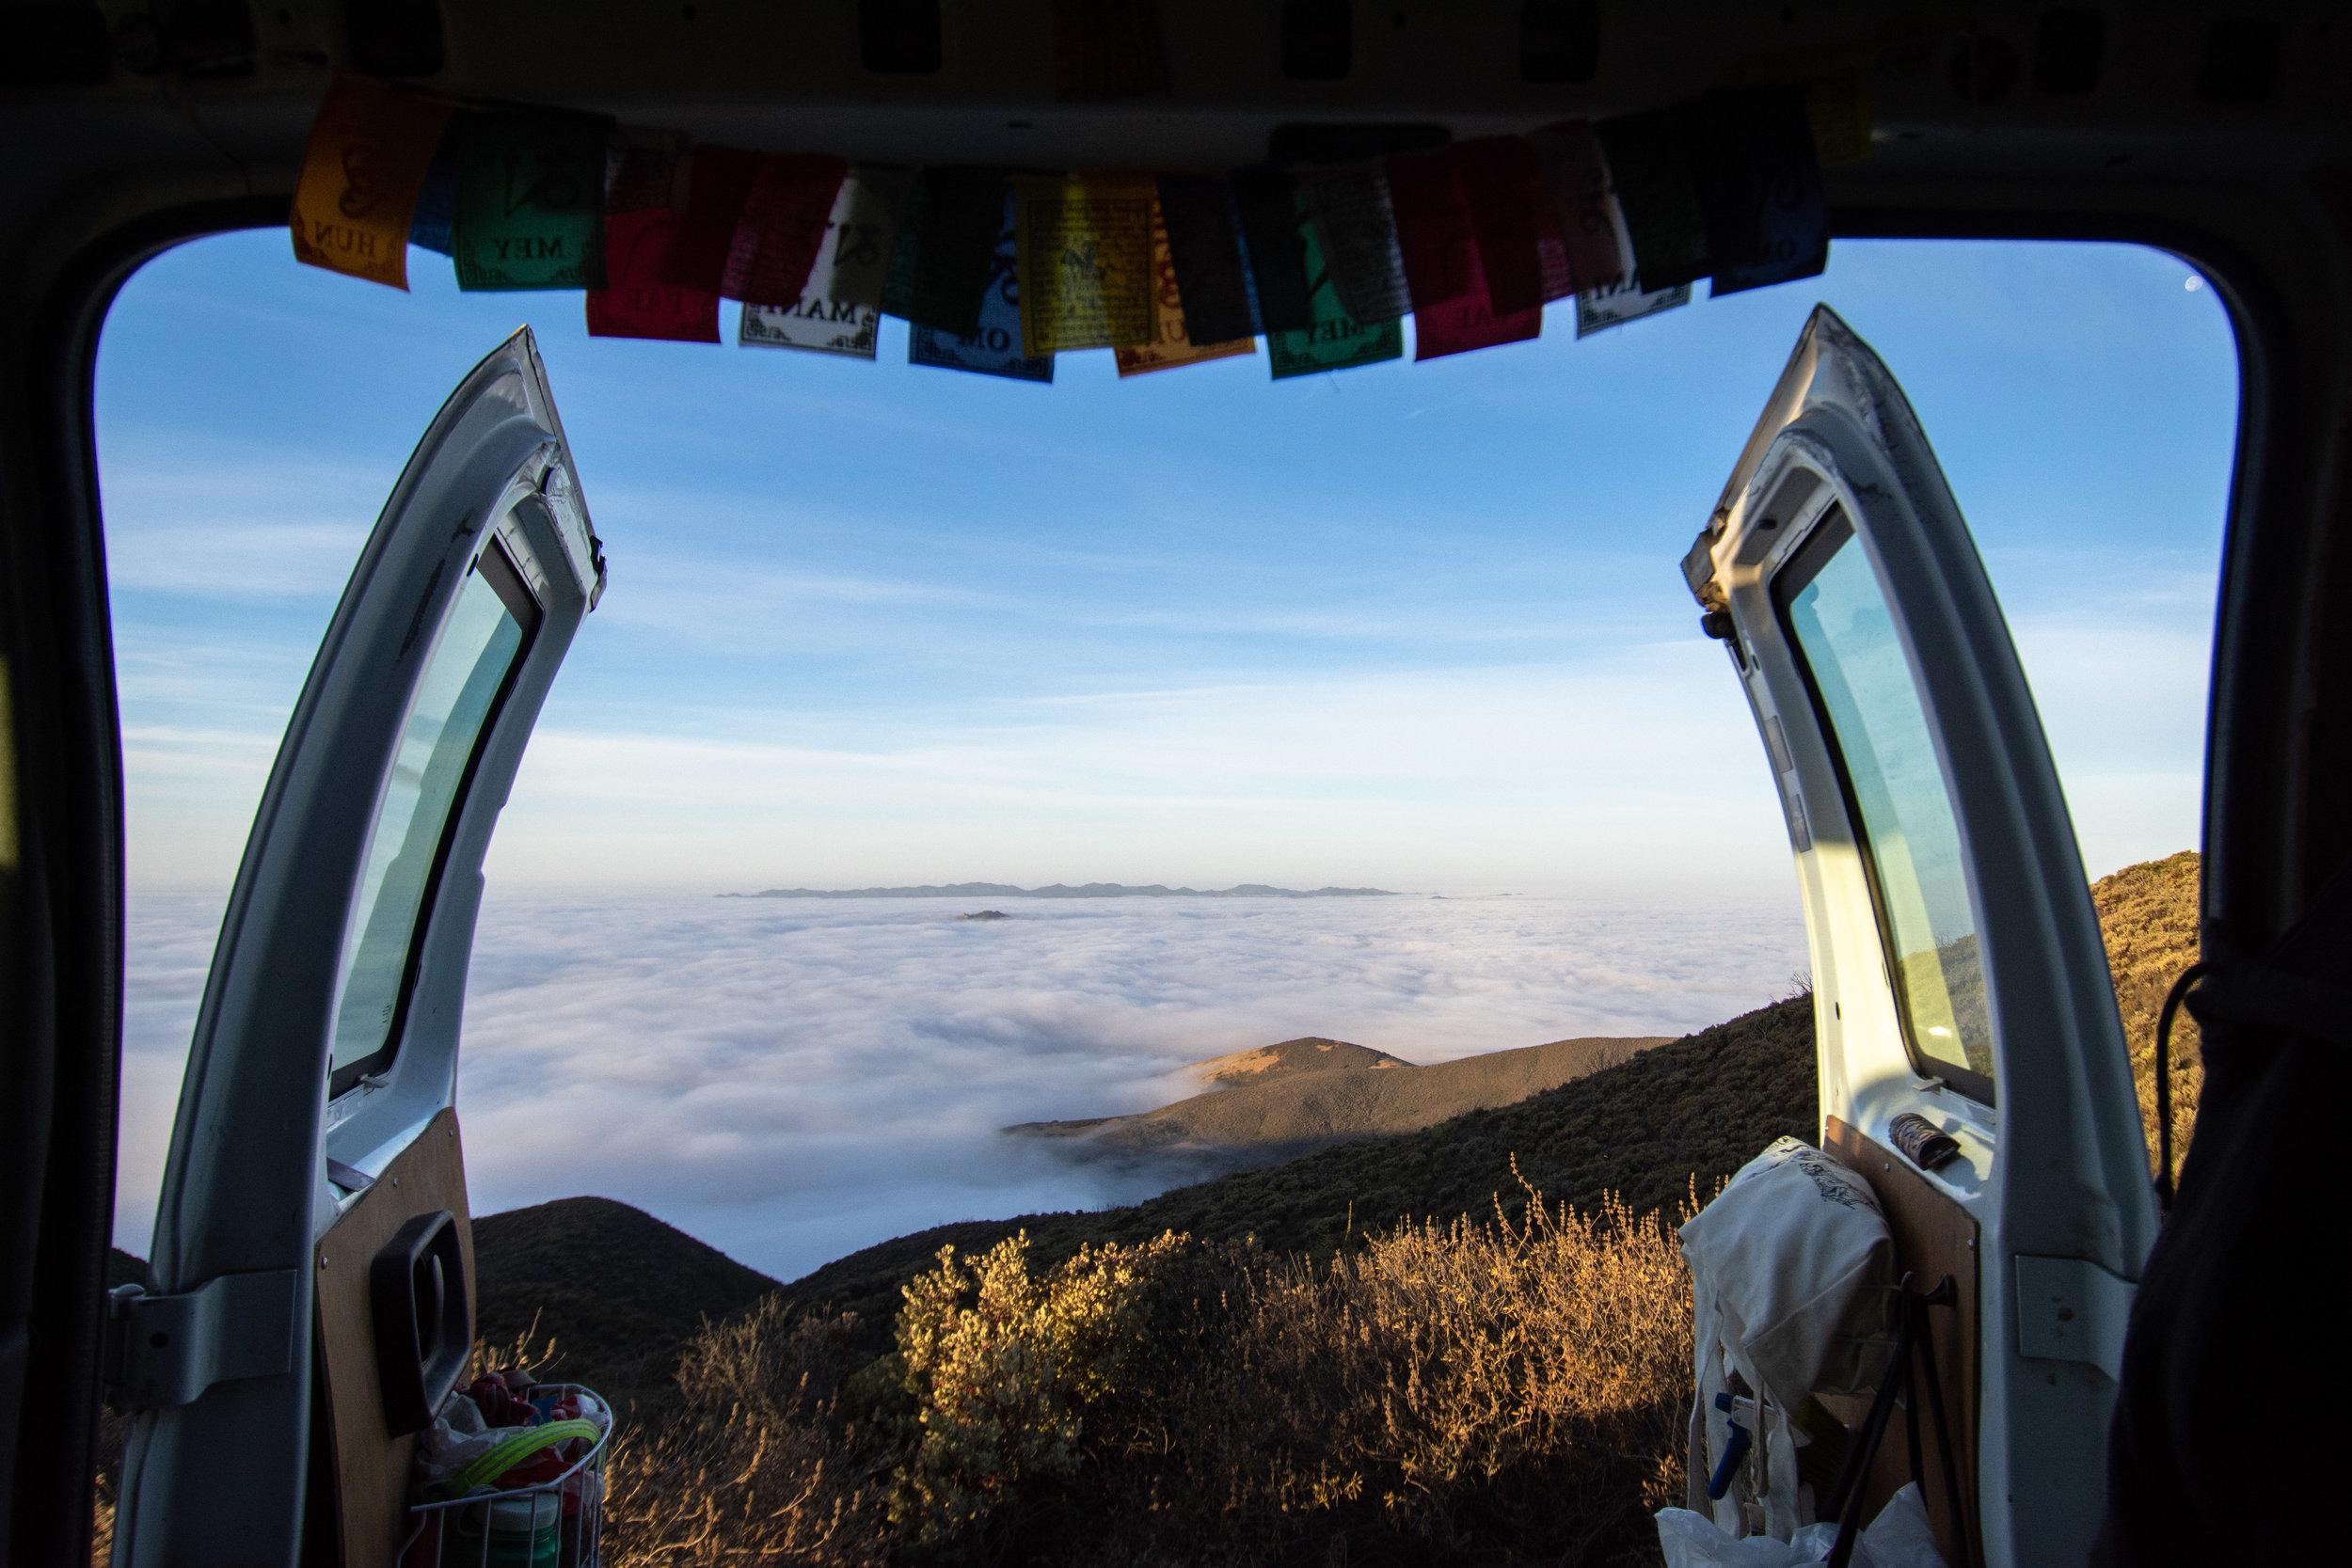 Sunrise in San Luis Obispo above the clouds